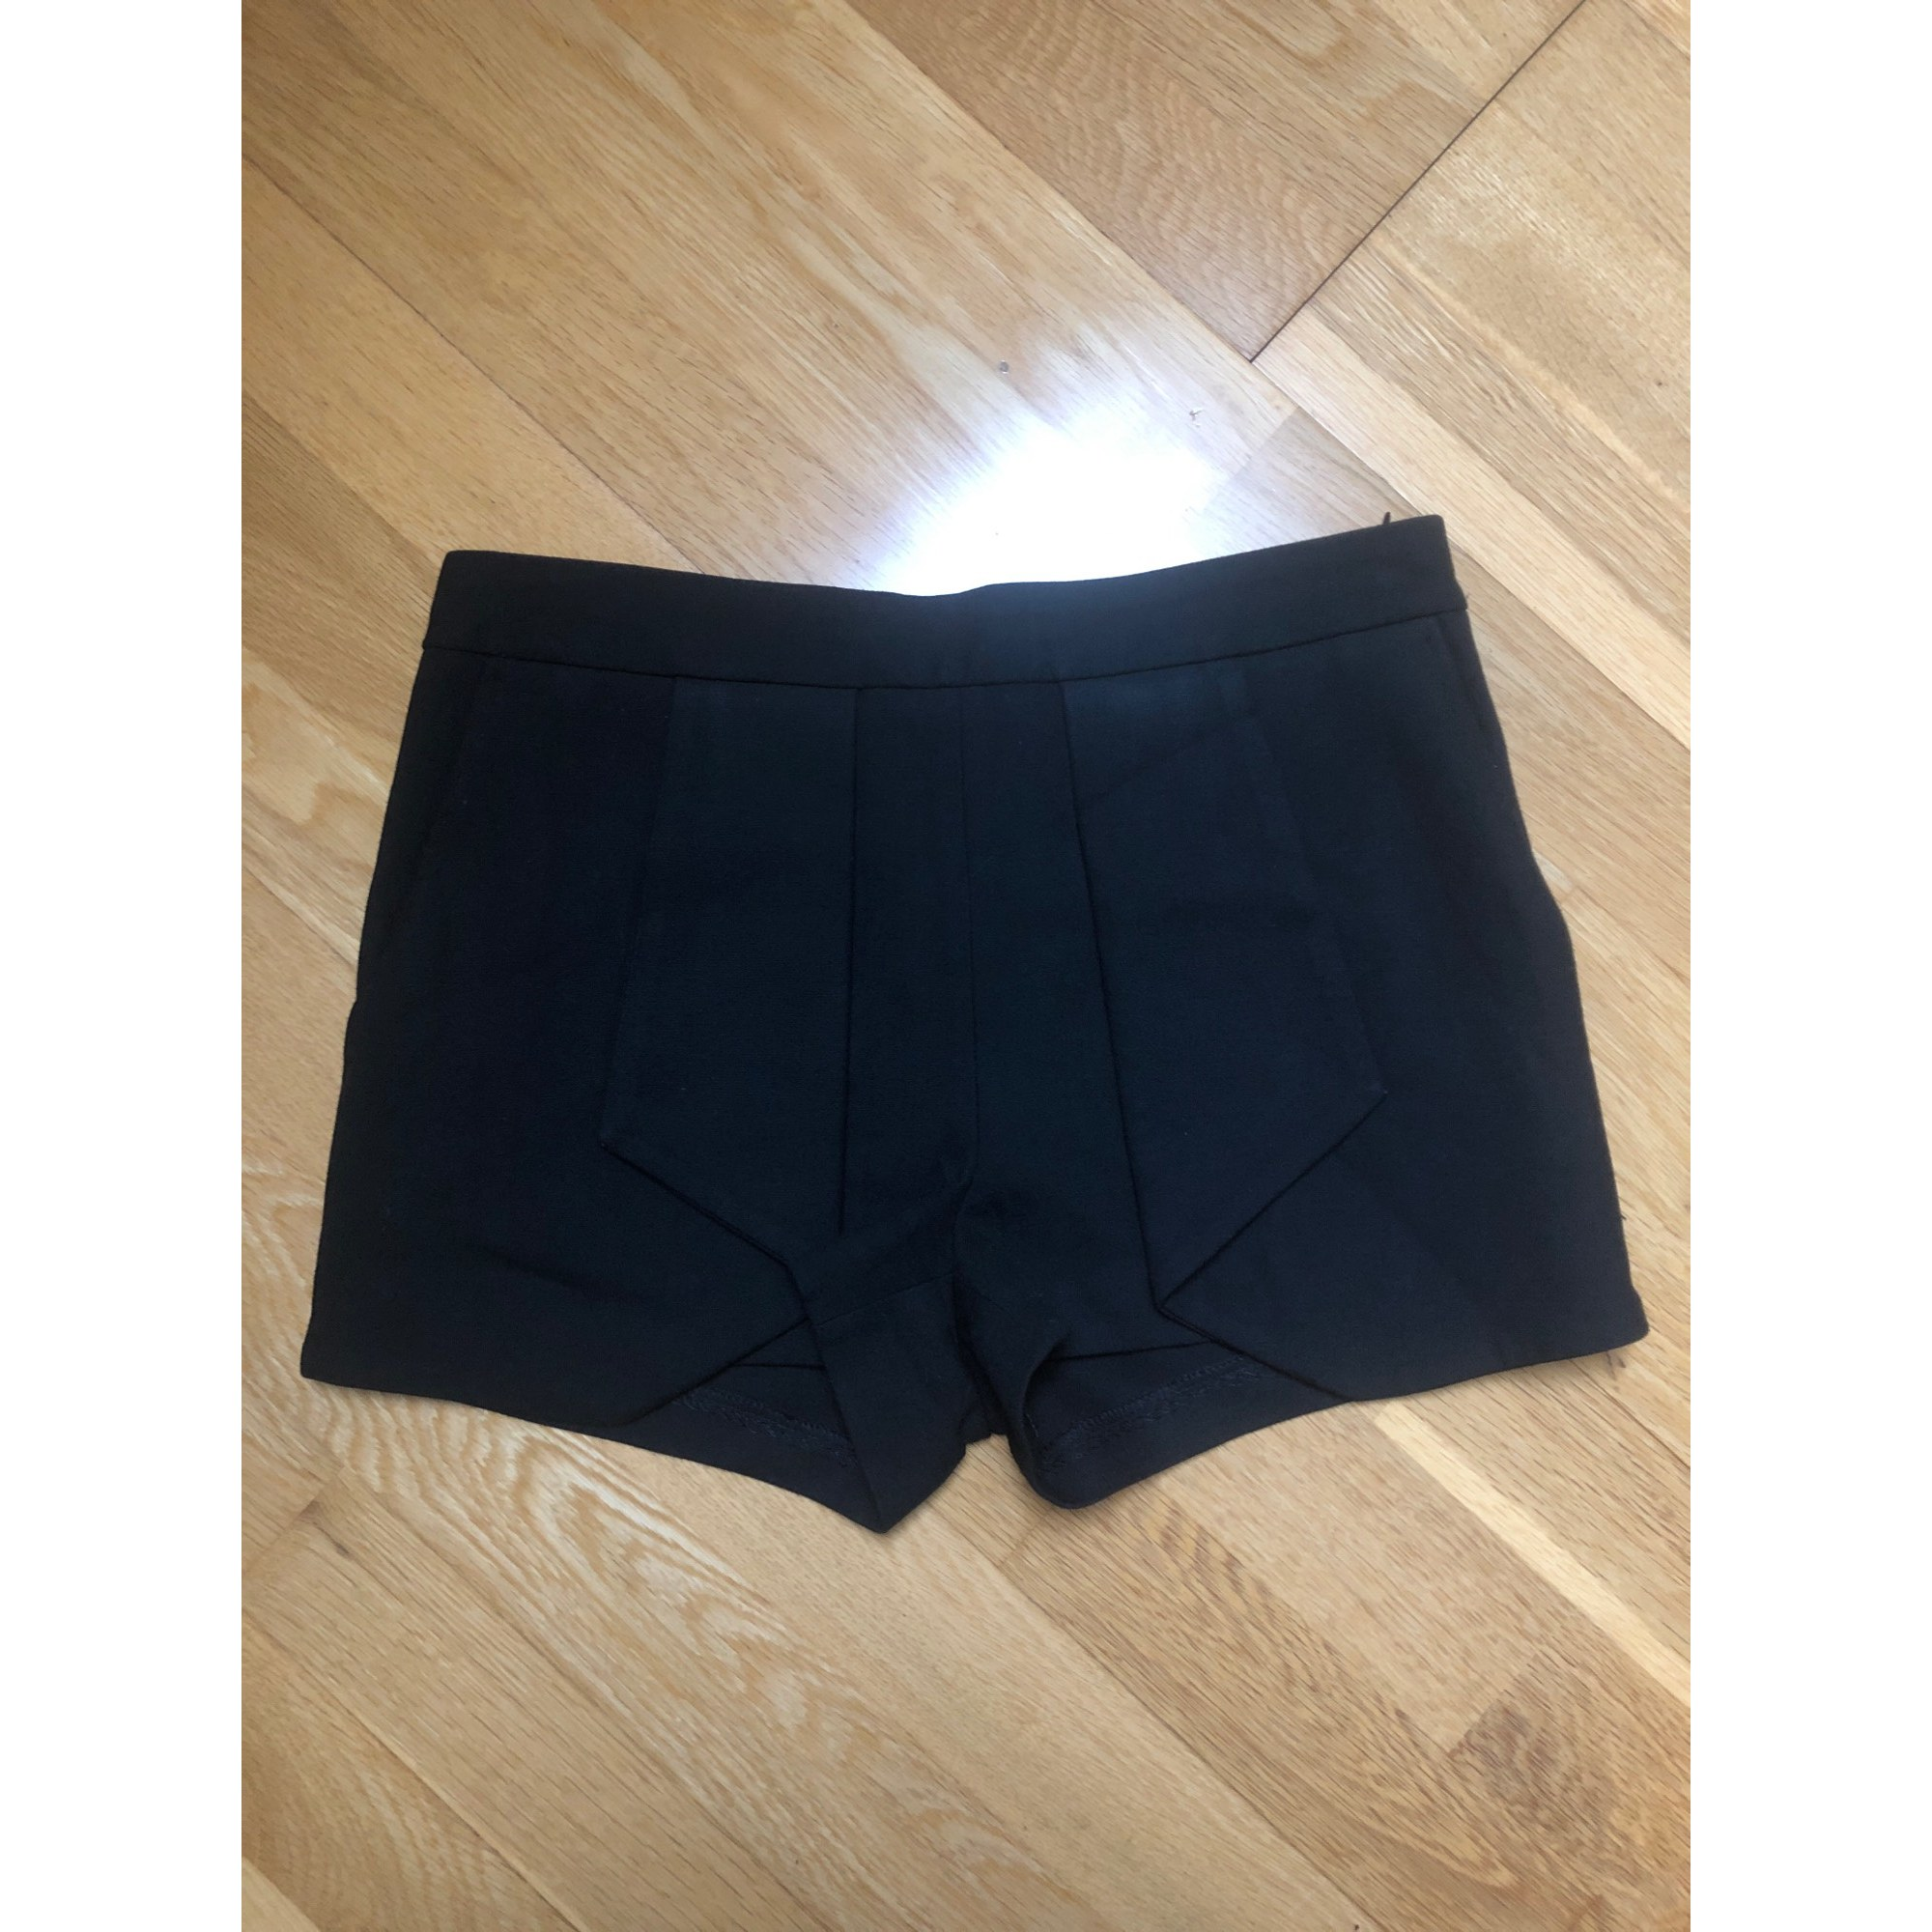 Short ZARA Noir